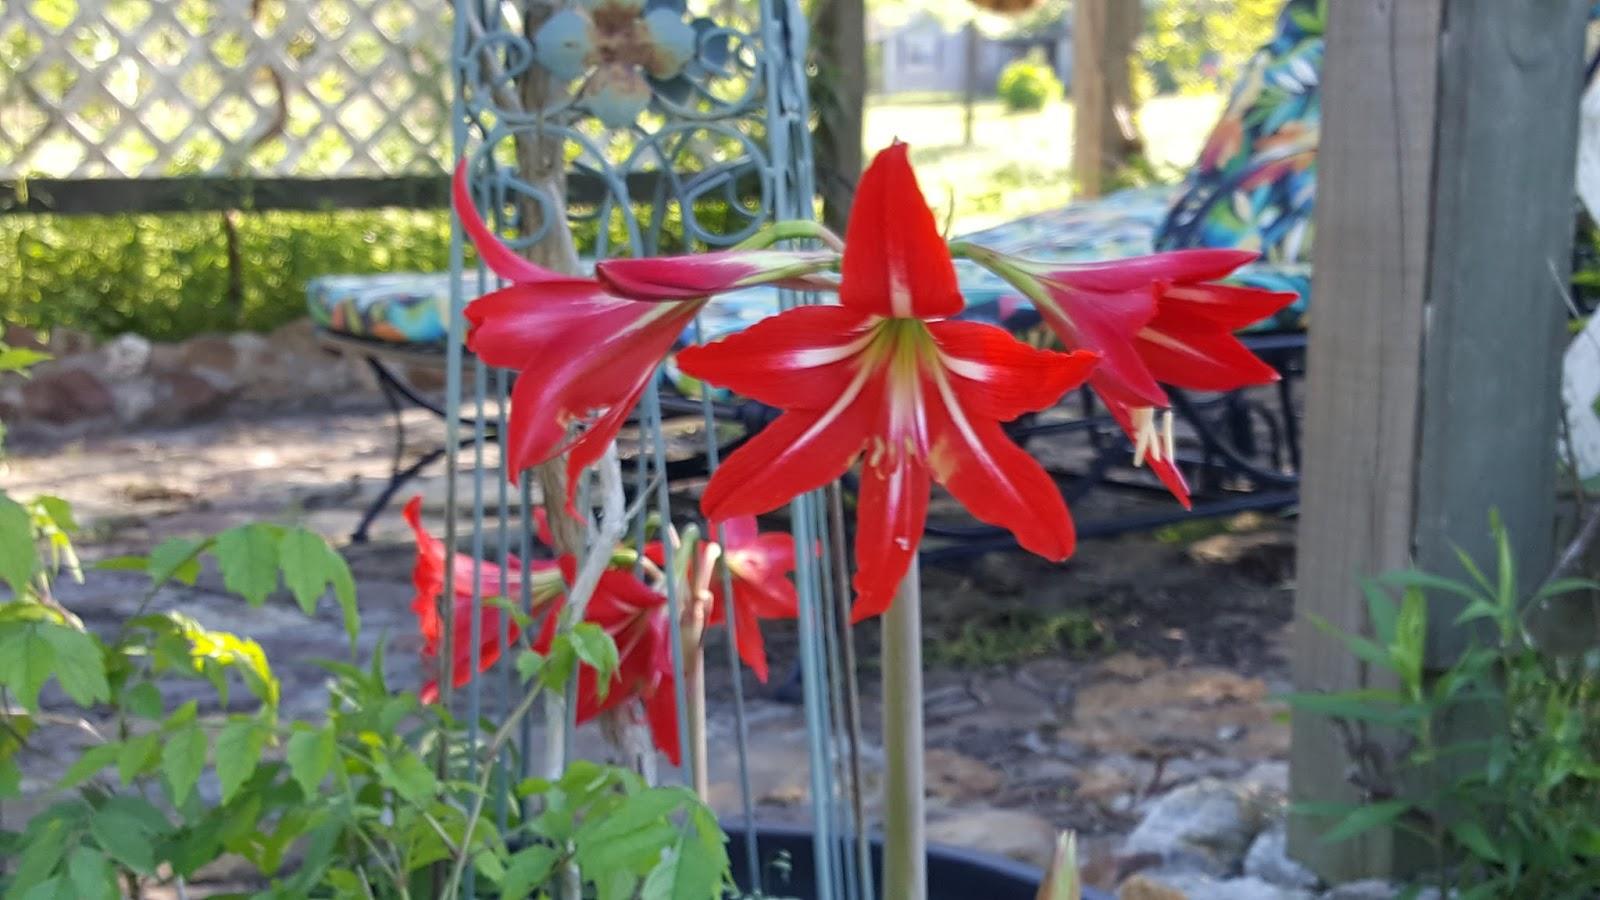 Alasandras place friday flowers friday flowers blooming in april ocean springs ms amaryllis mightylinksfo